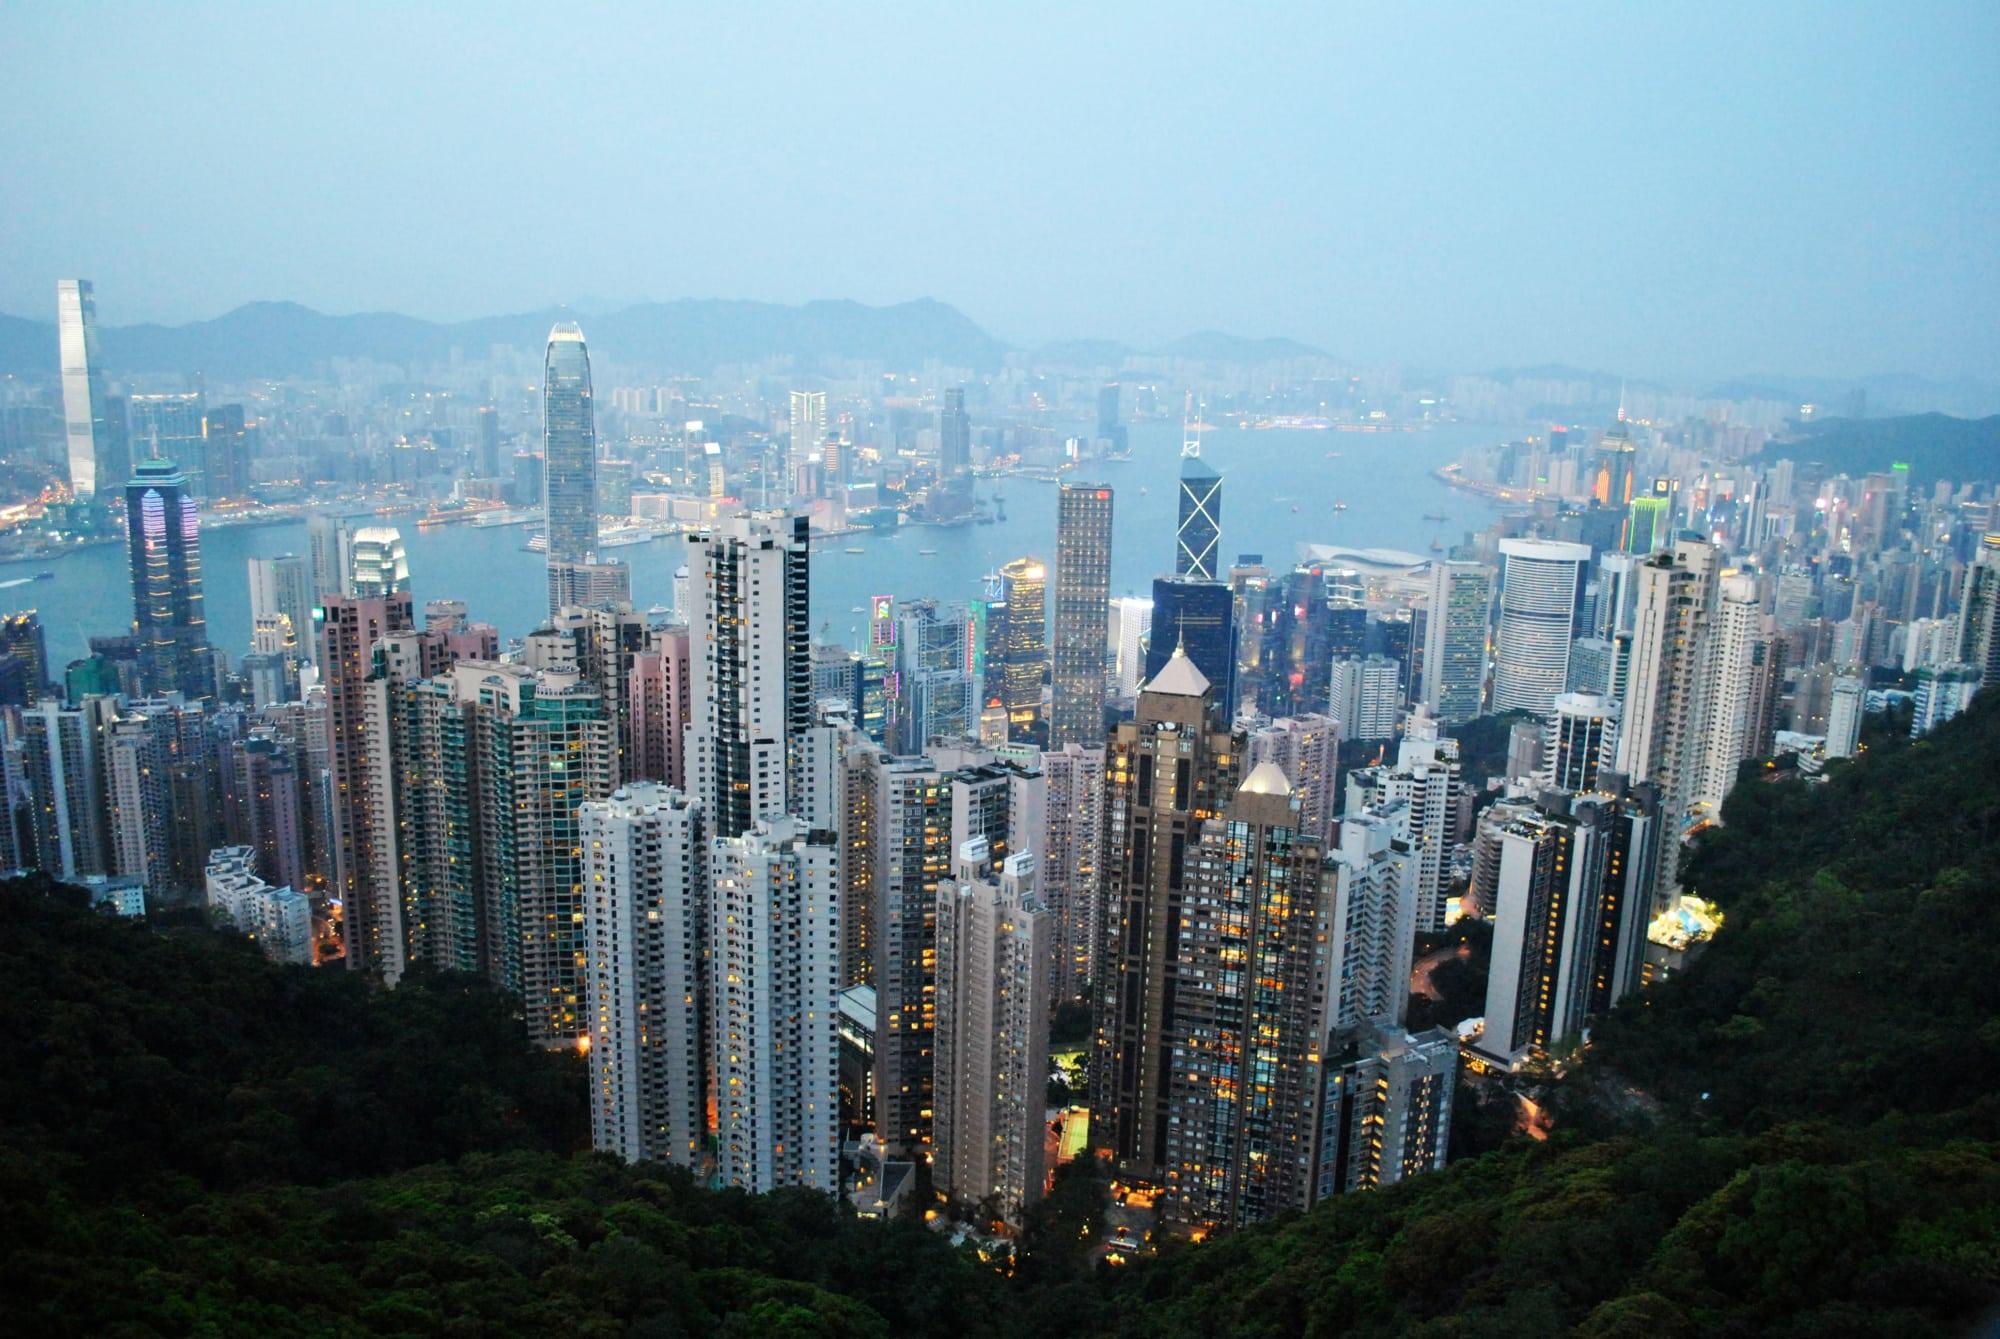 Hohe Kunst in Hongkong - reisen EXCLUSIV